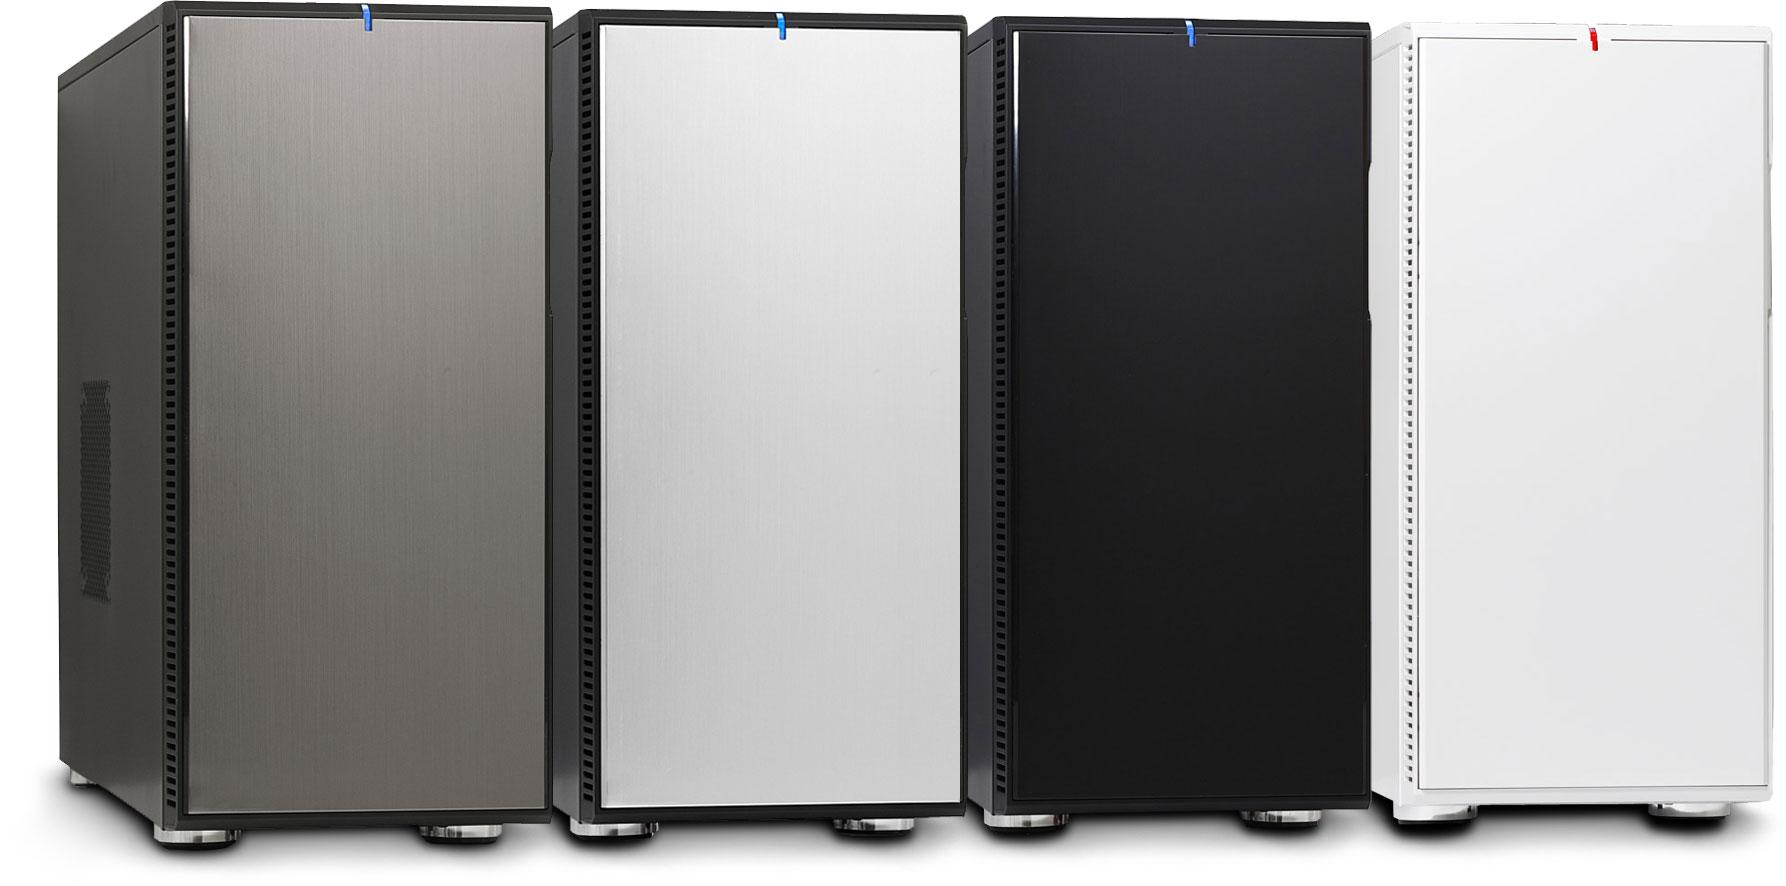 Fractal design define r3 computer cases for Define minimalist